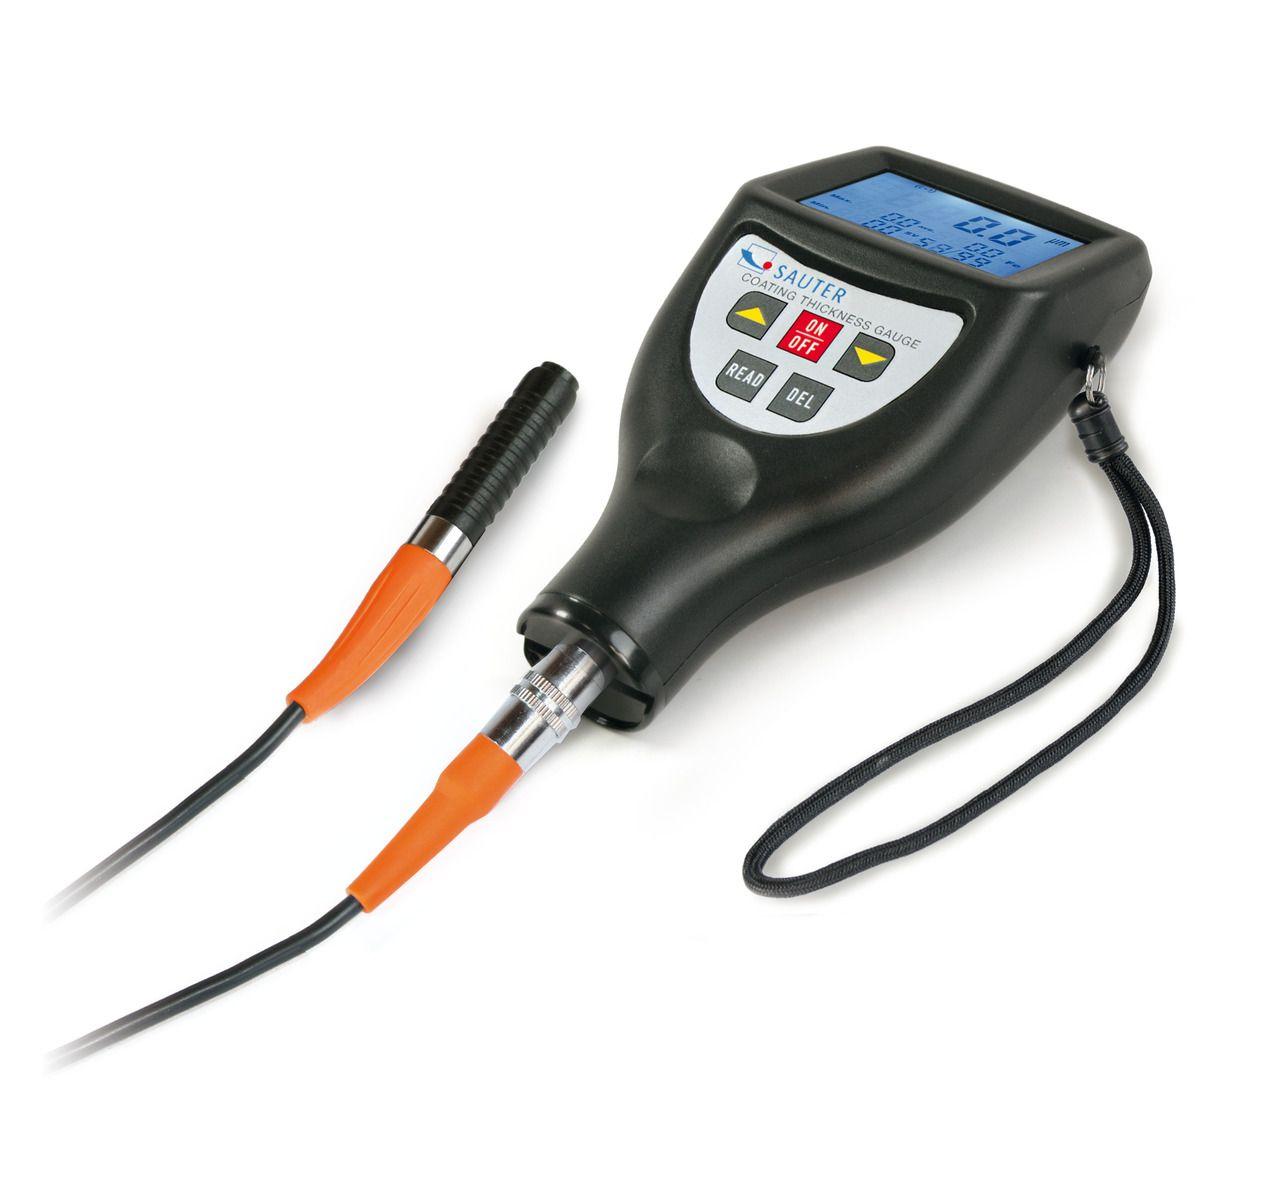 TG Sauter Digital Coating Thickness Gauge